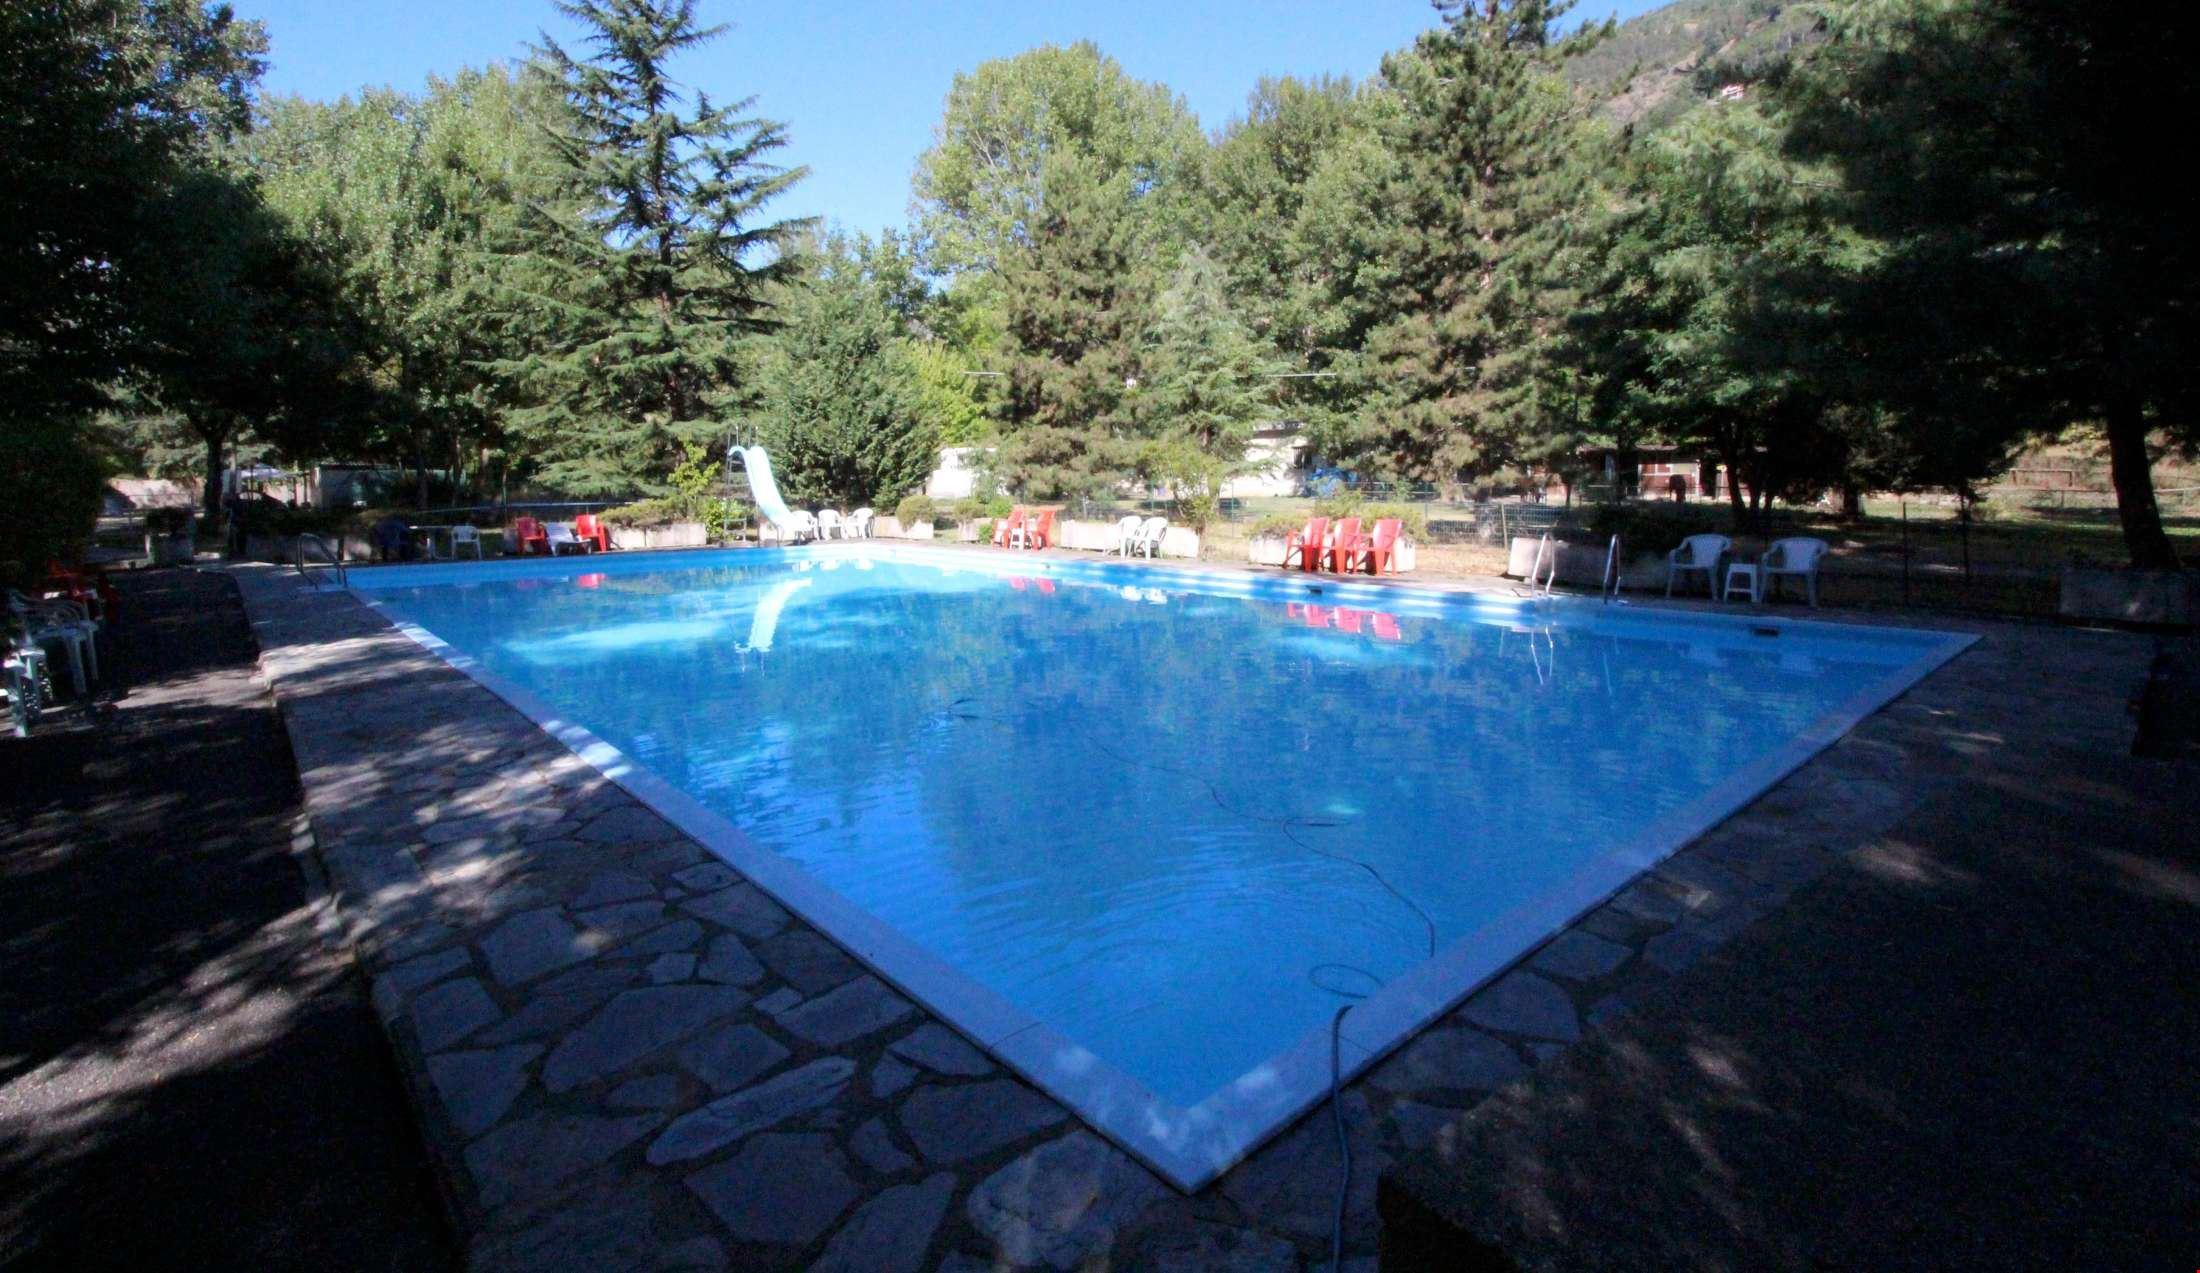 Camping International Touring con Piscina, in Valle d'Aosta